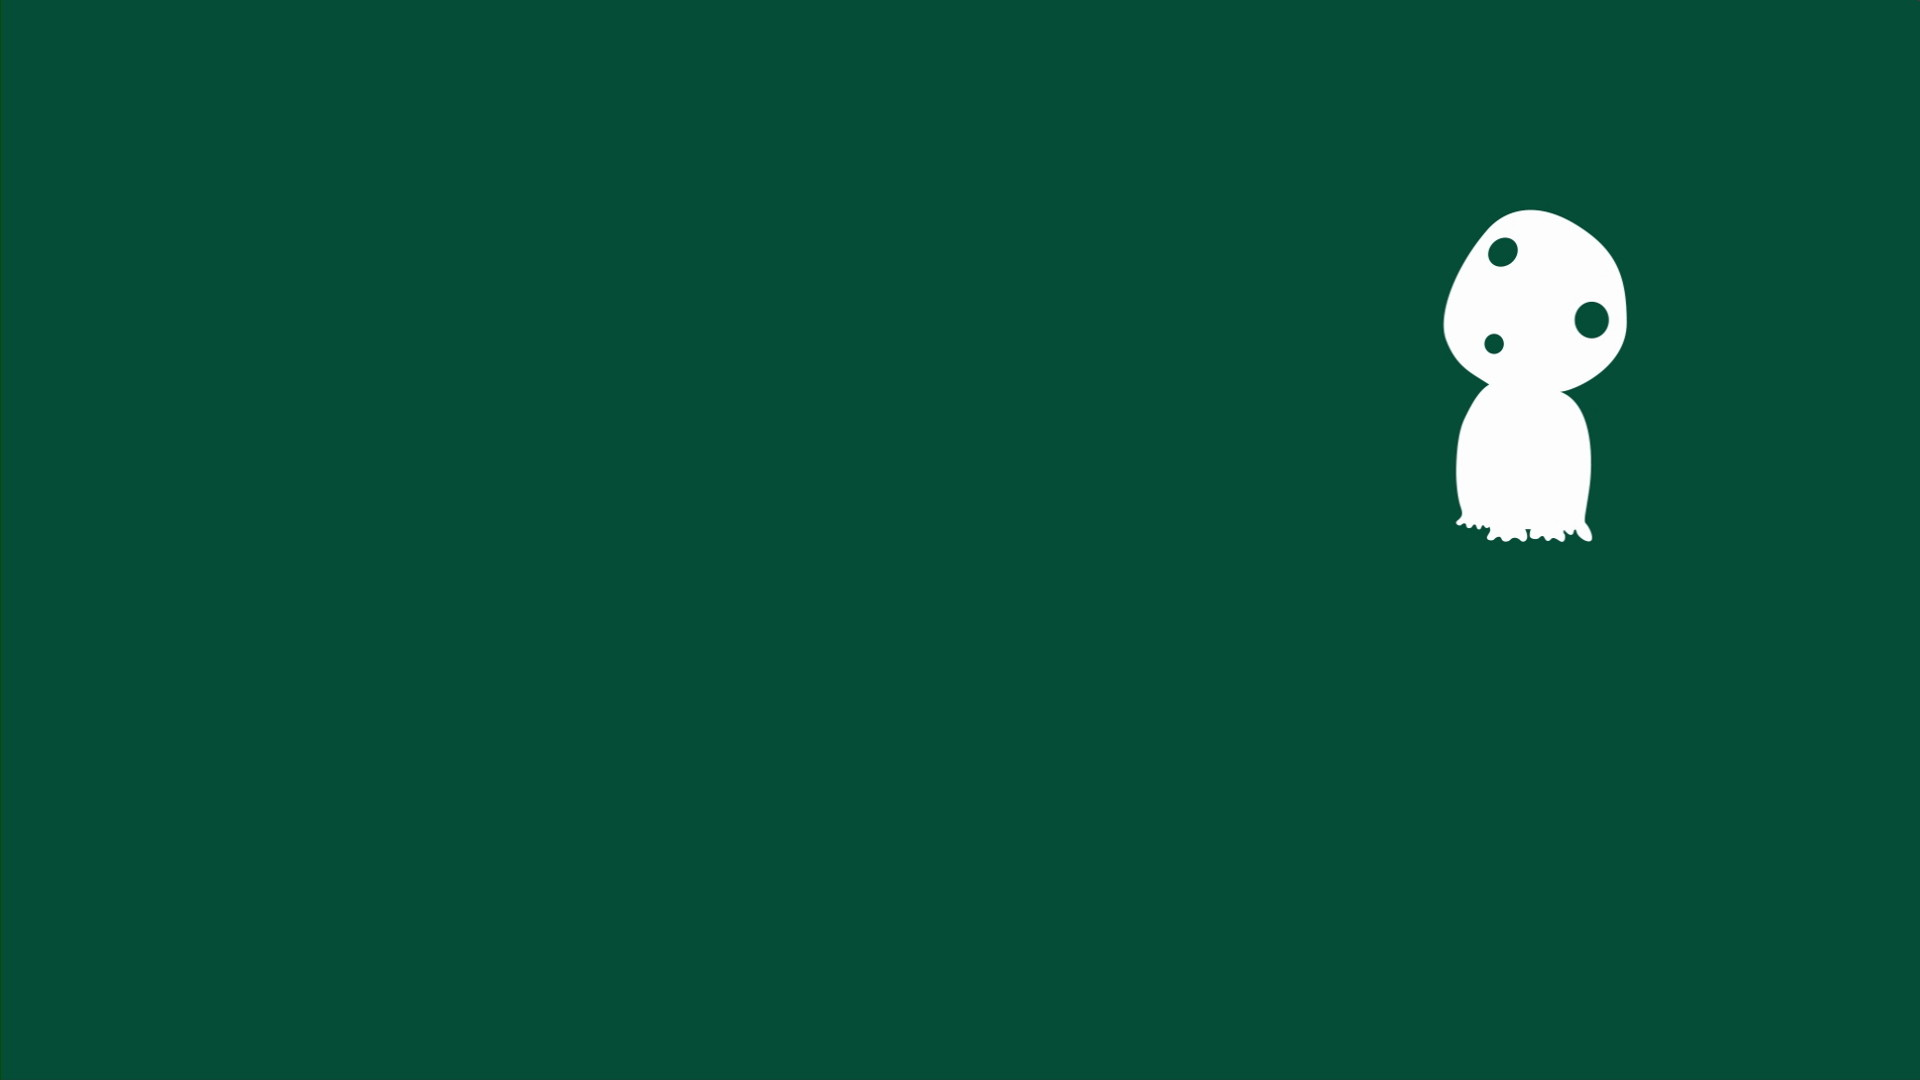 Princess Mononoke HD wallpaper dump [≥1920×1080] (more in comments!) :  wallpapers